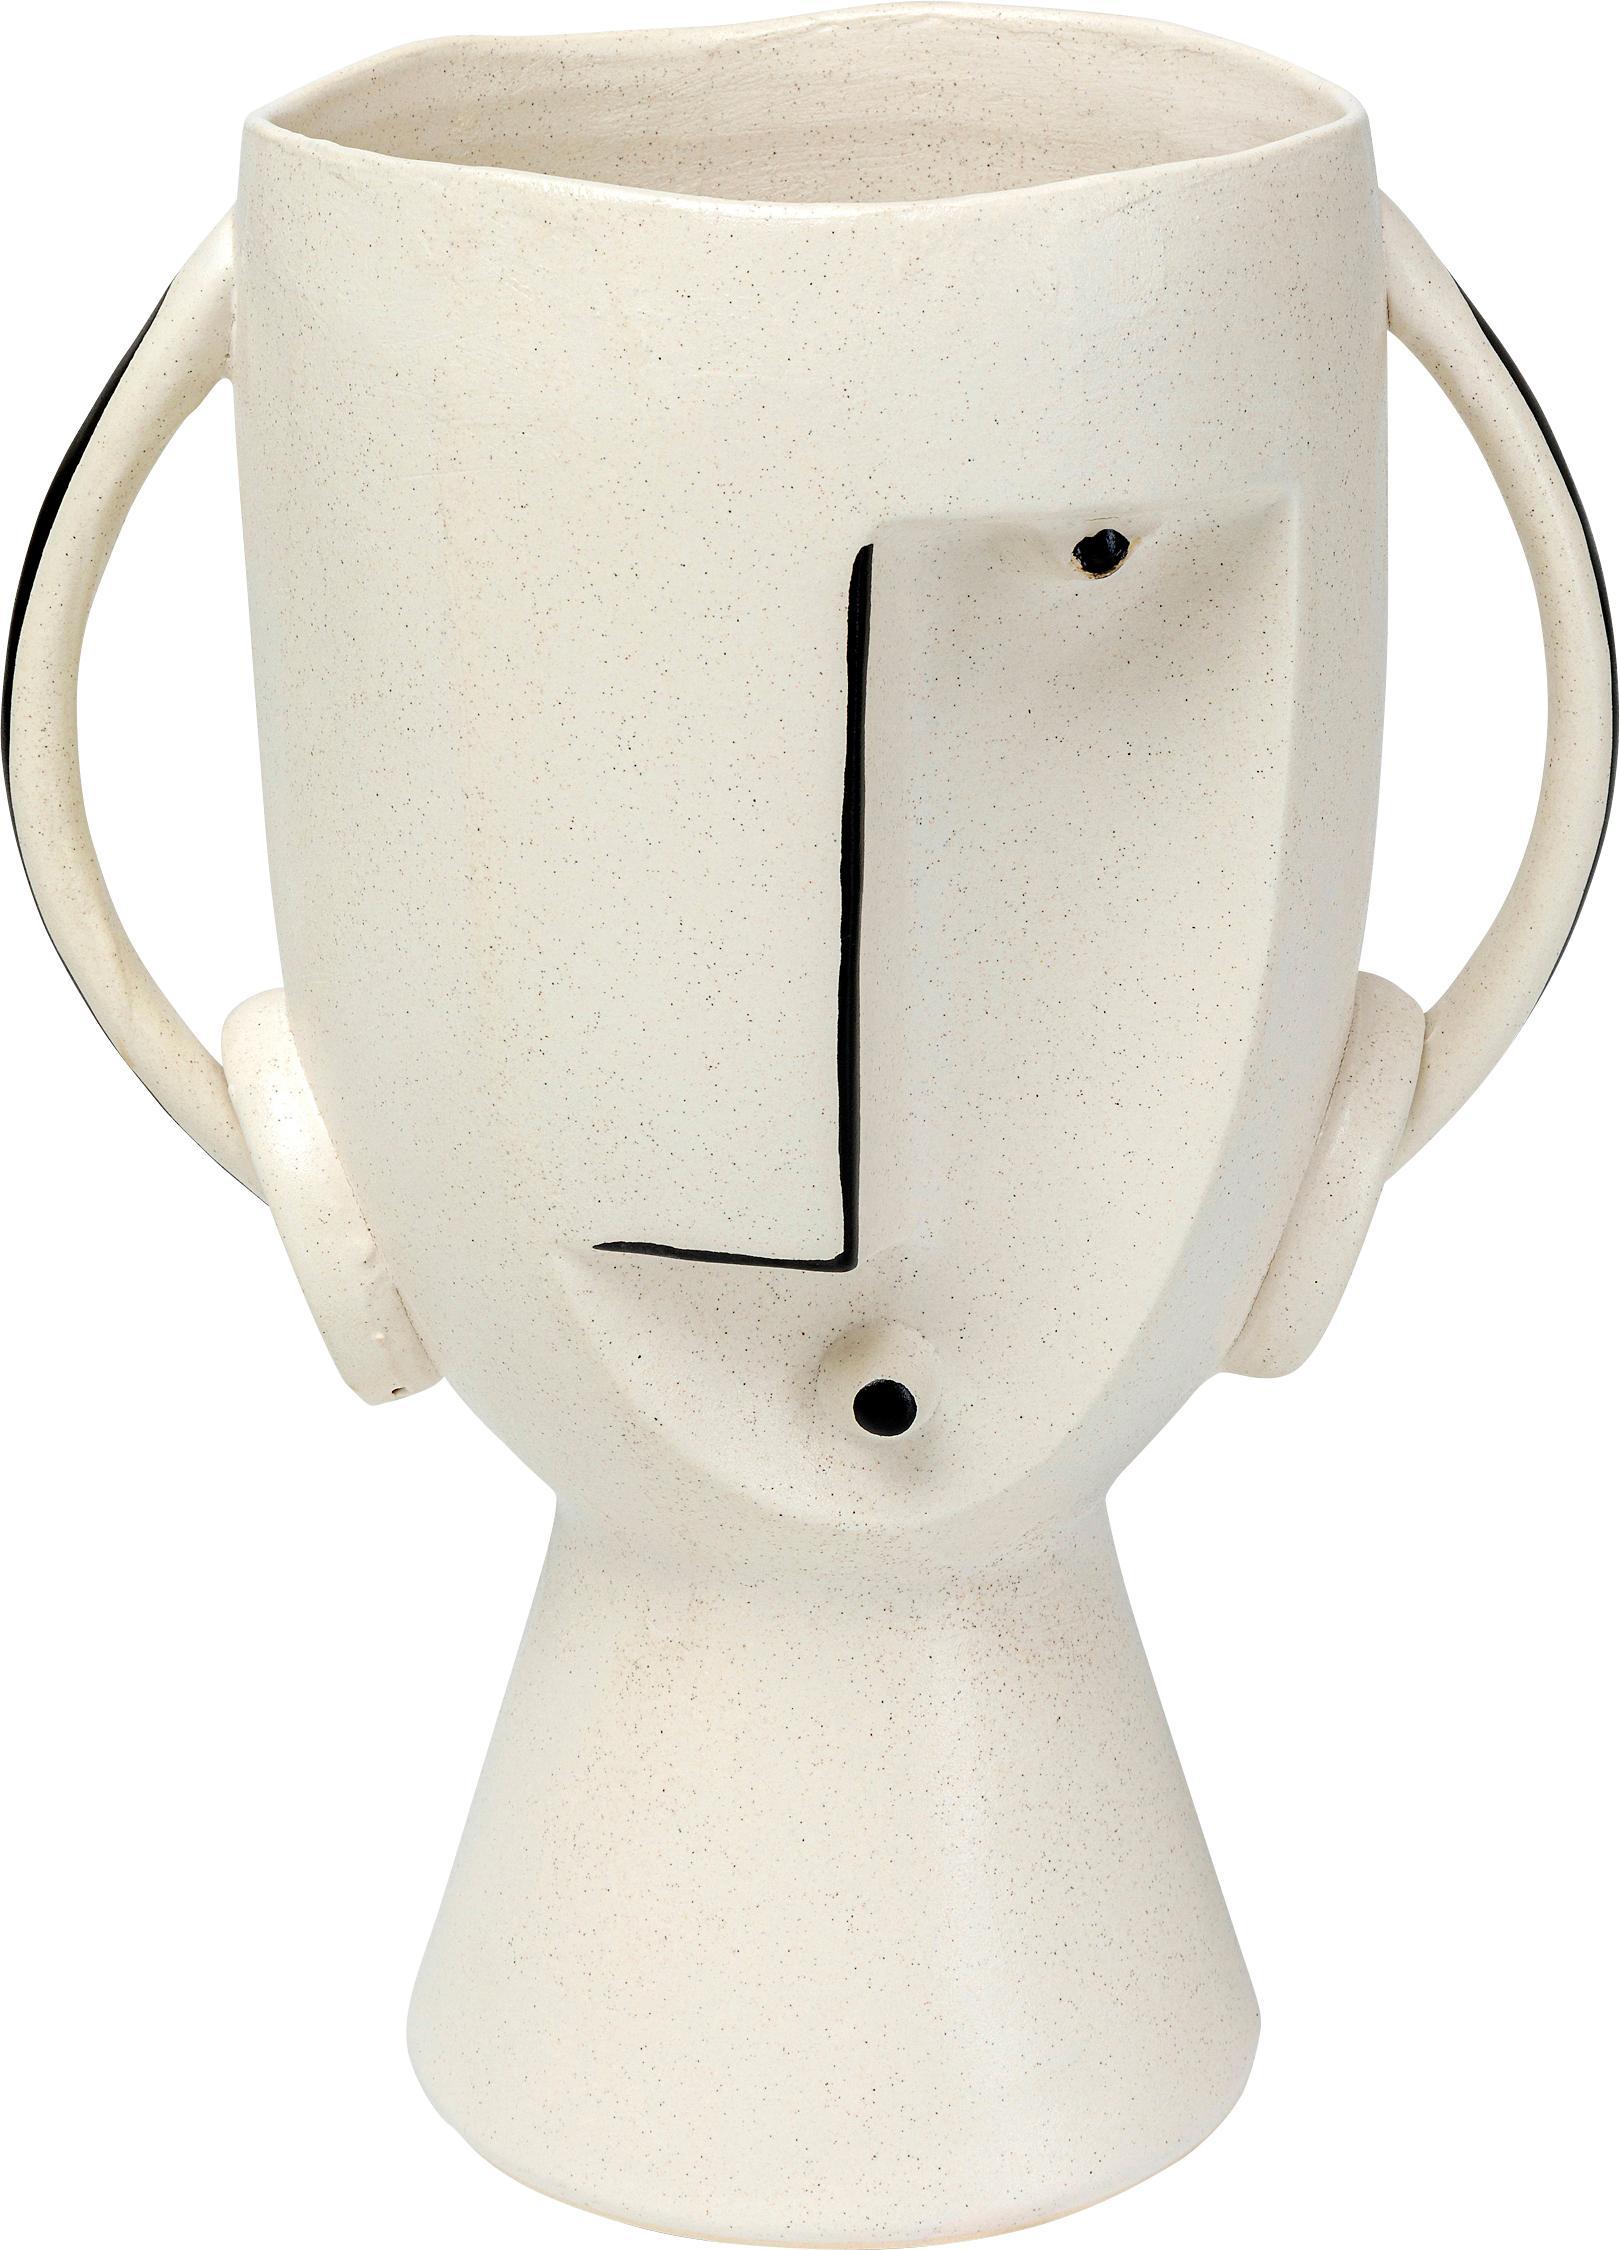 Vaso in terracotta Face, Gres, Bianco, nero, Larg. 23 x Alt. 30 cm